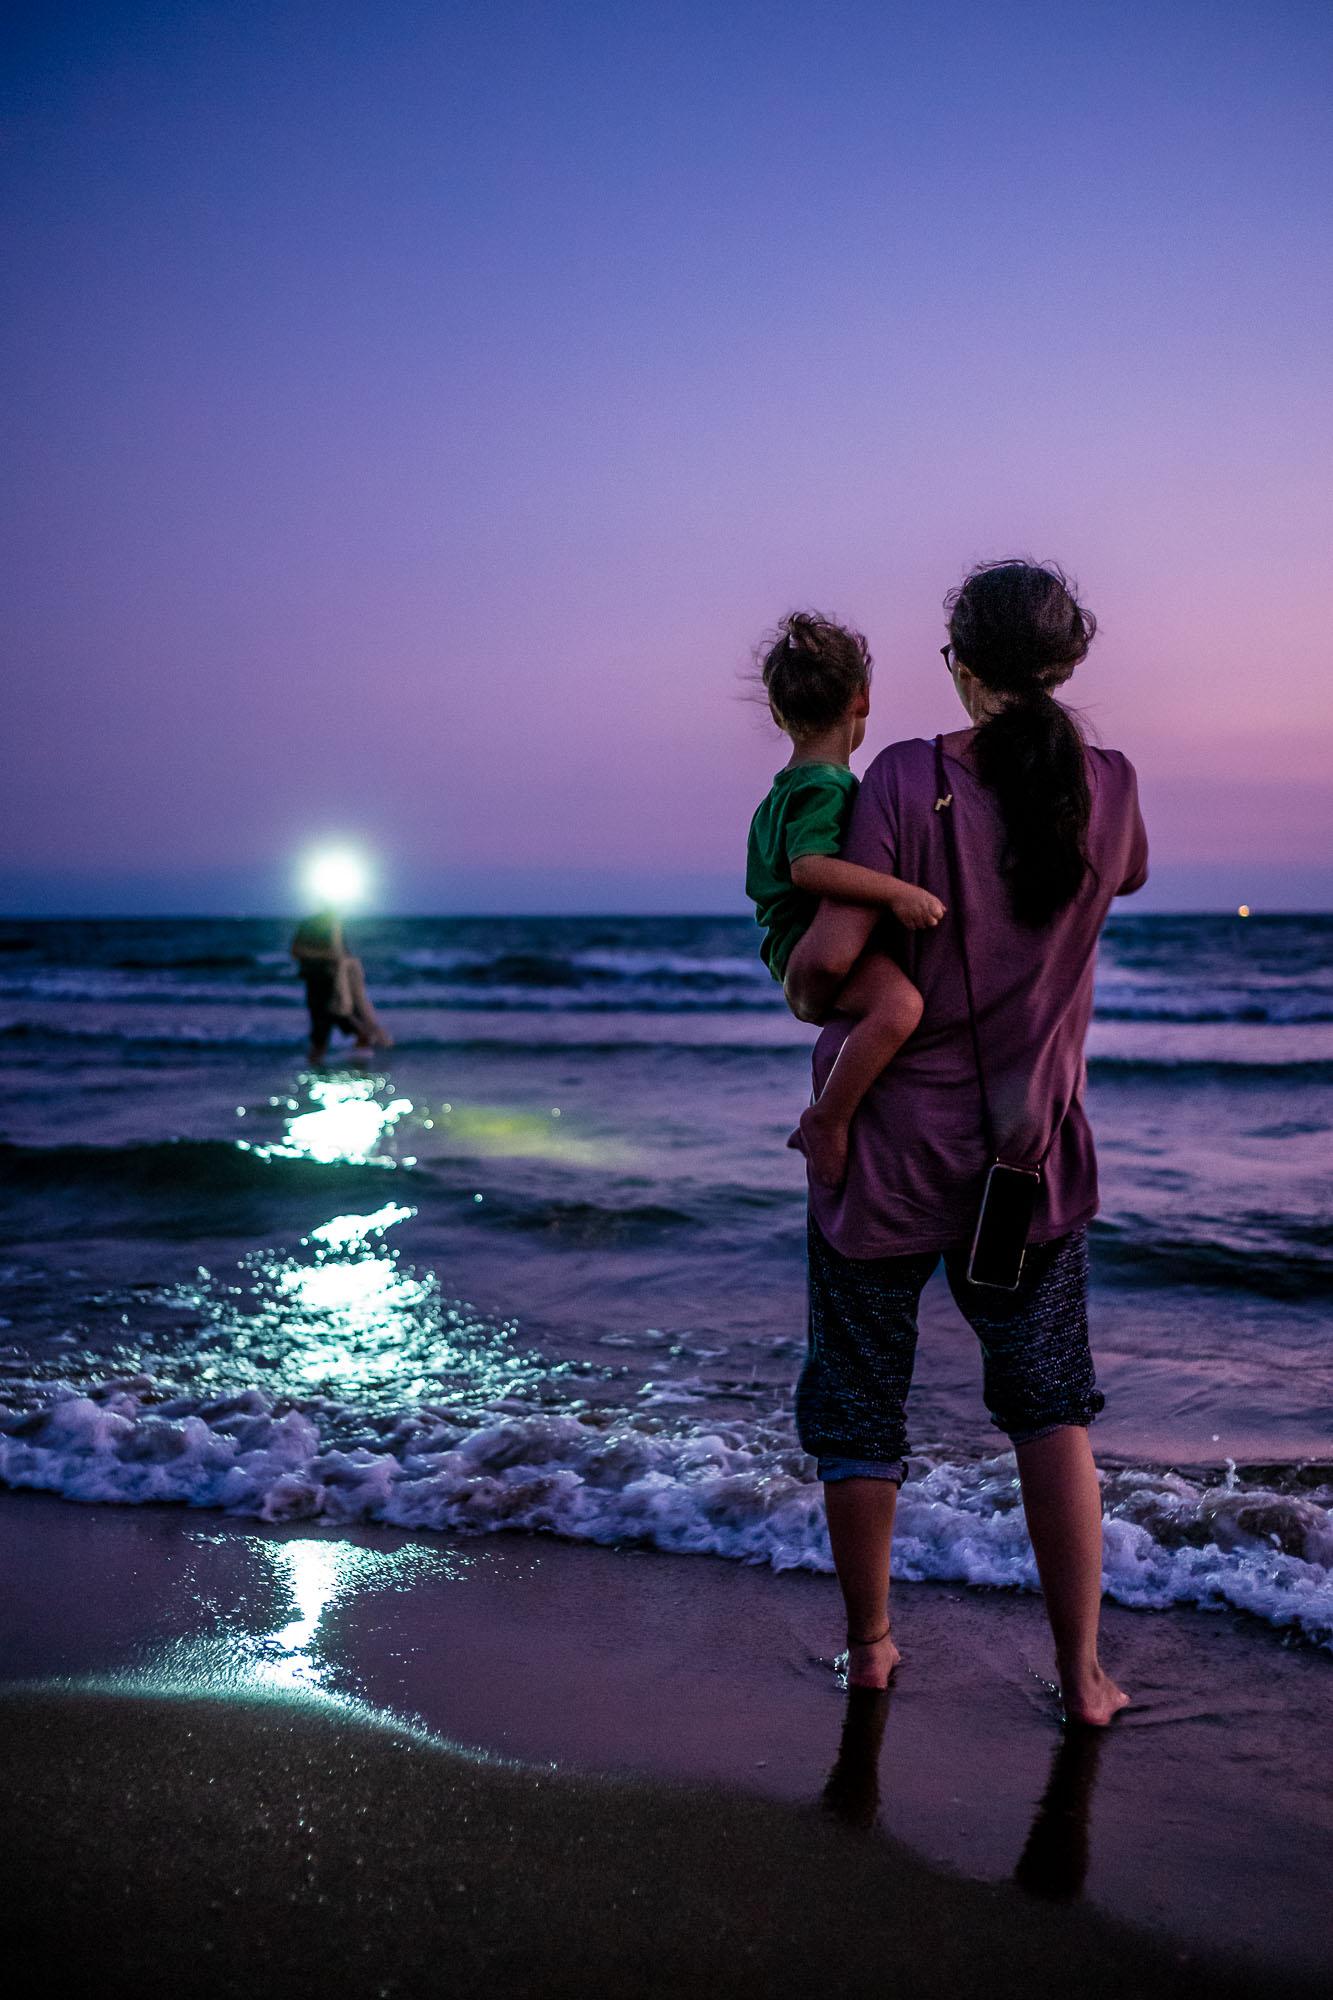 Lumi & Ulya watching a fisherman during sunset at Burnaz beach